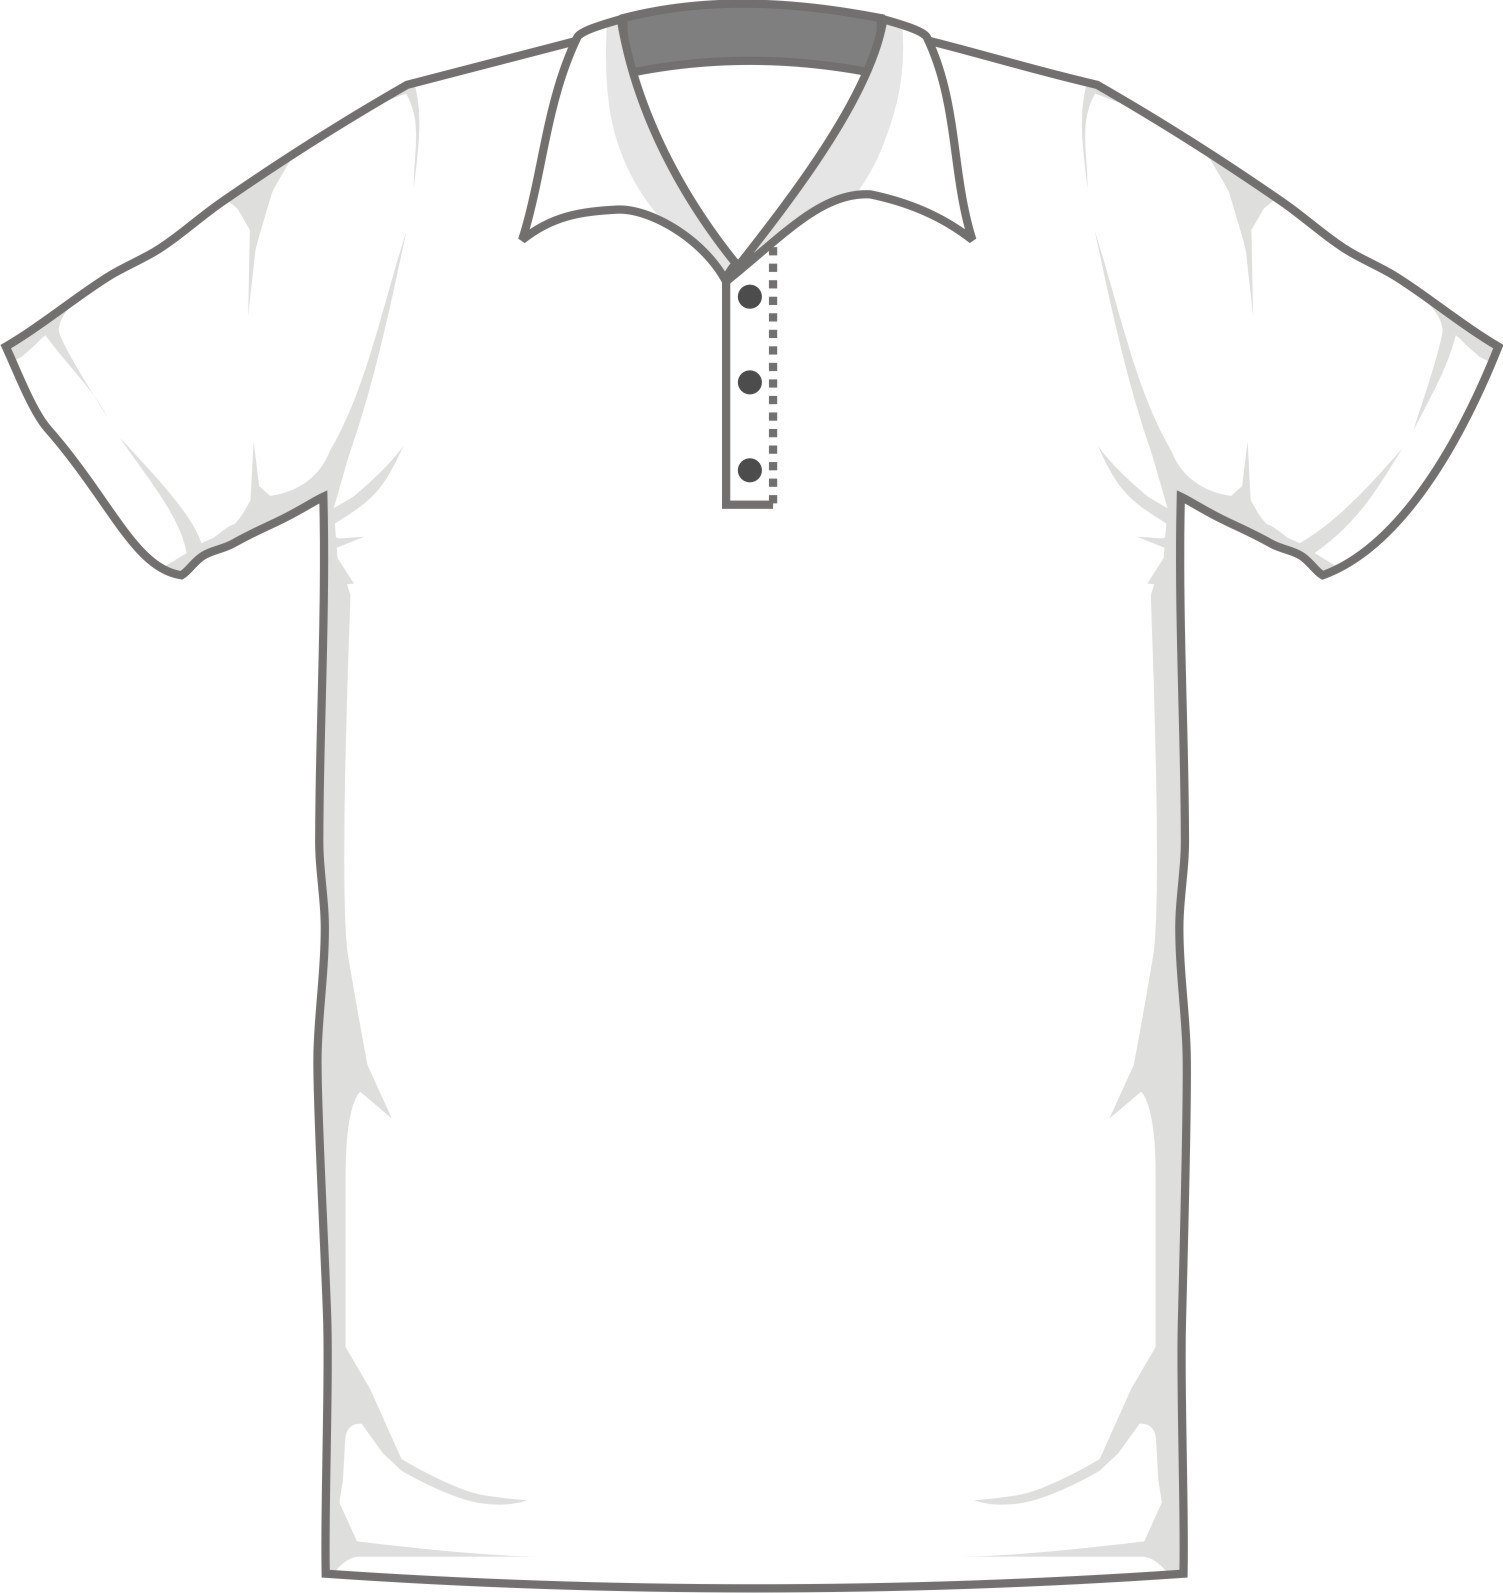 Polo Shirt Men Template   Joy Studio Design Gallery - Best ...